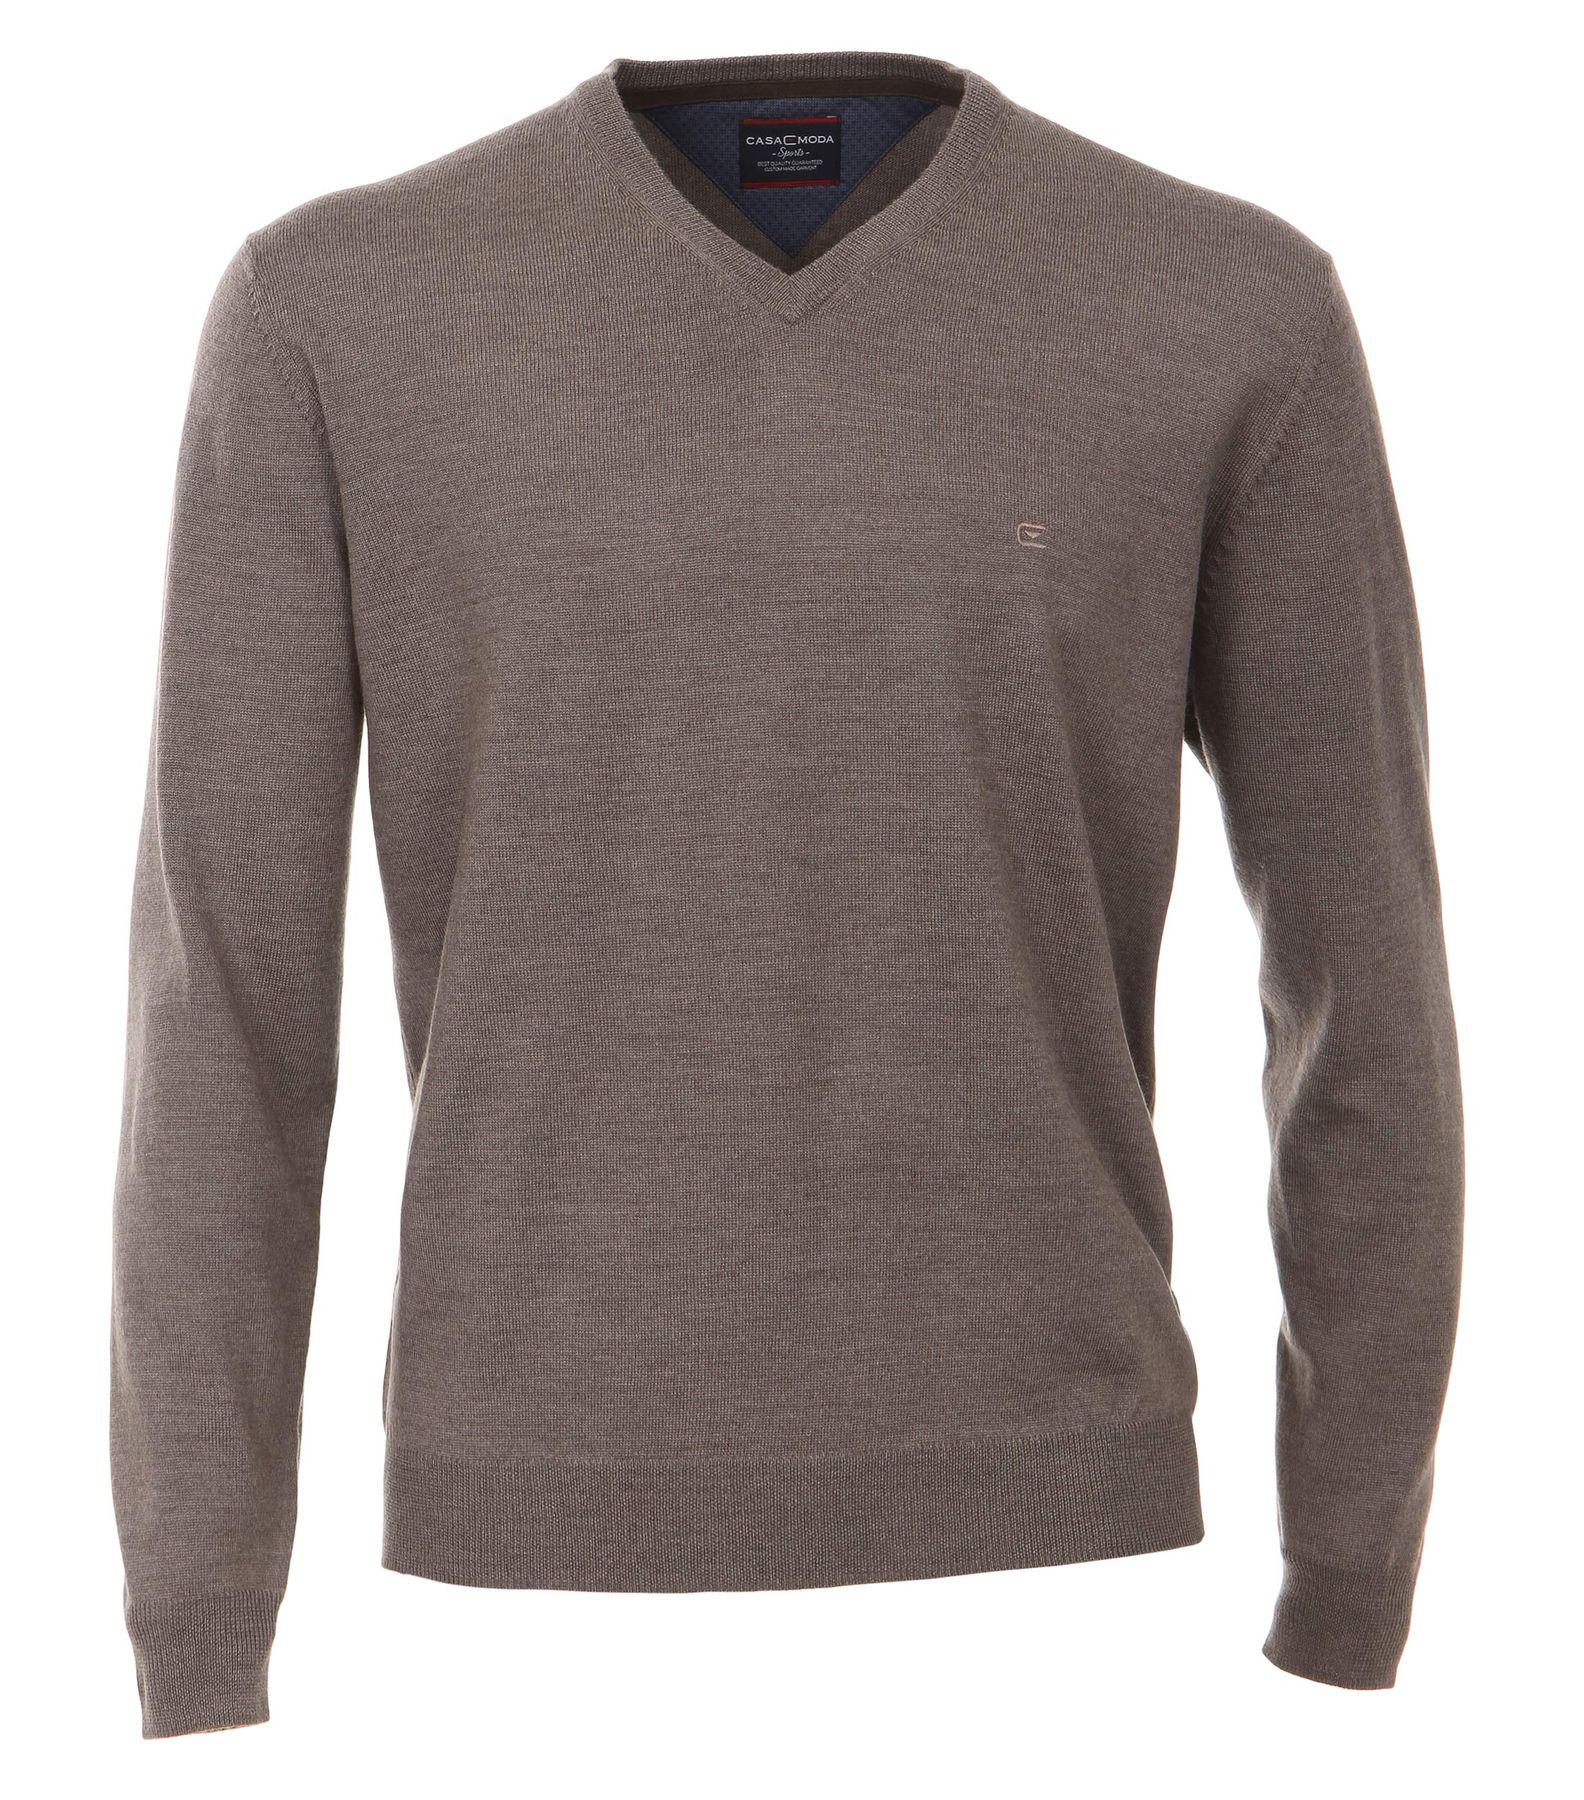 Casa Moda - Herren Merino Pullover mit V-Ausschnitt (462519900) – Bild 5